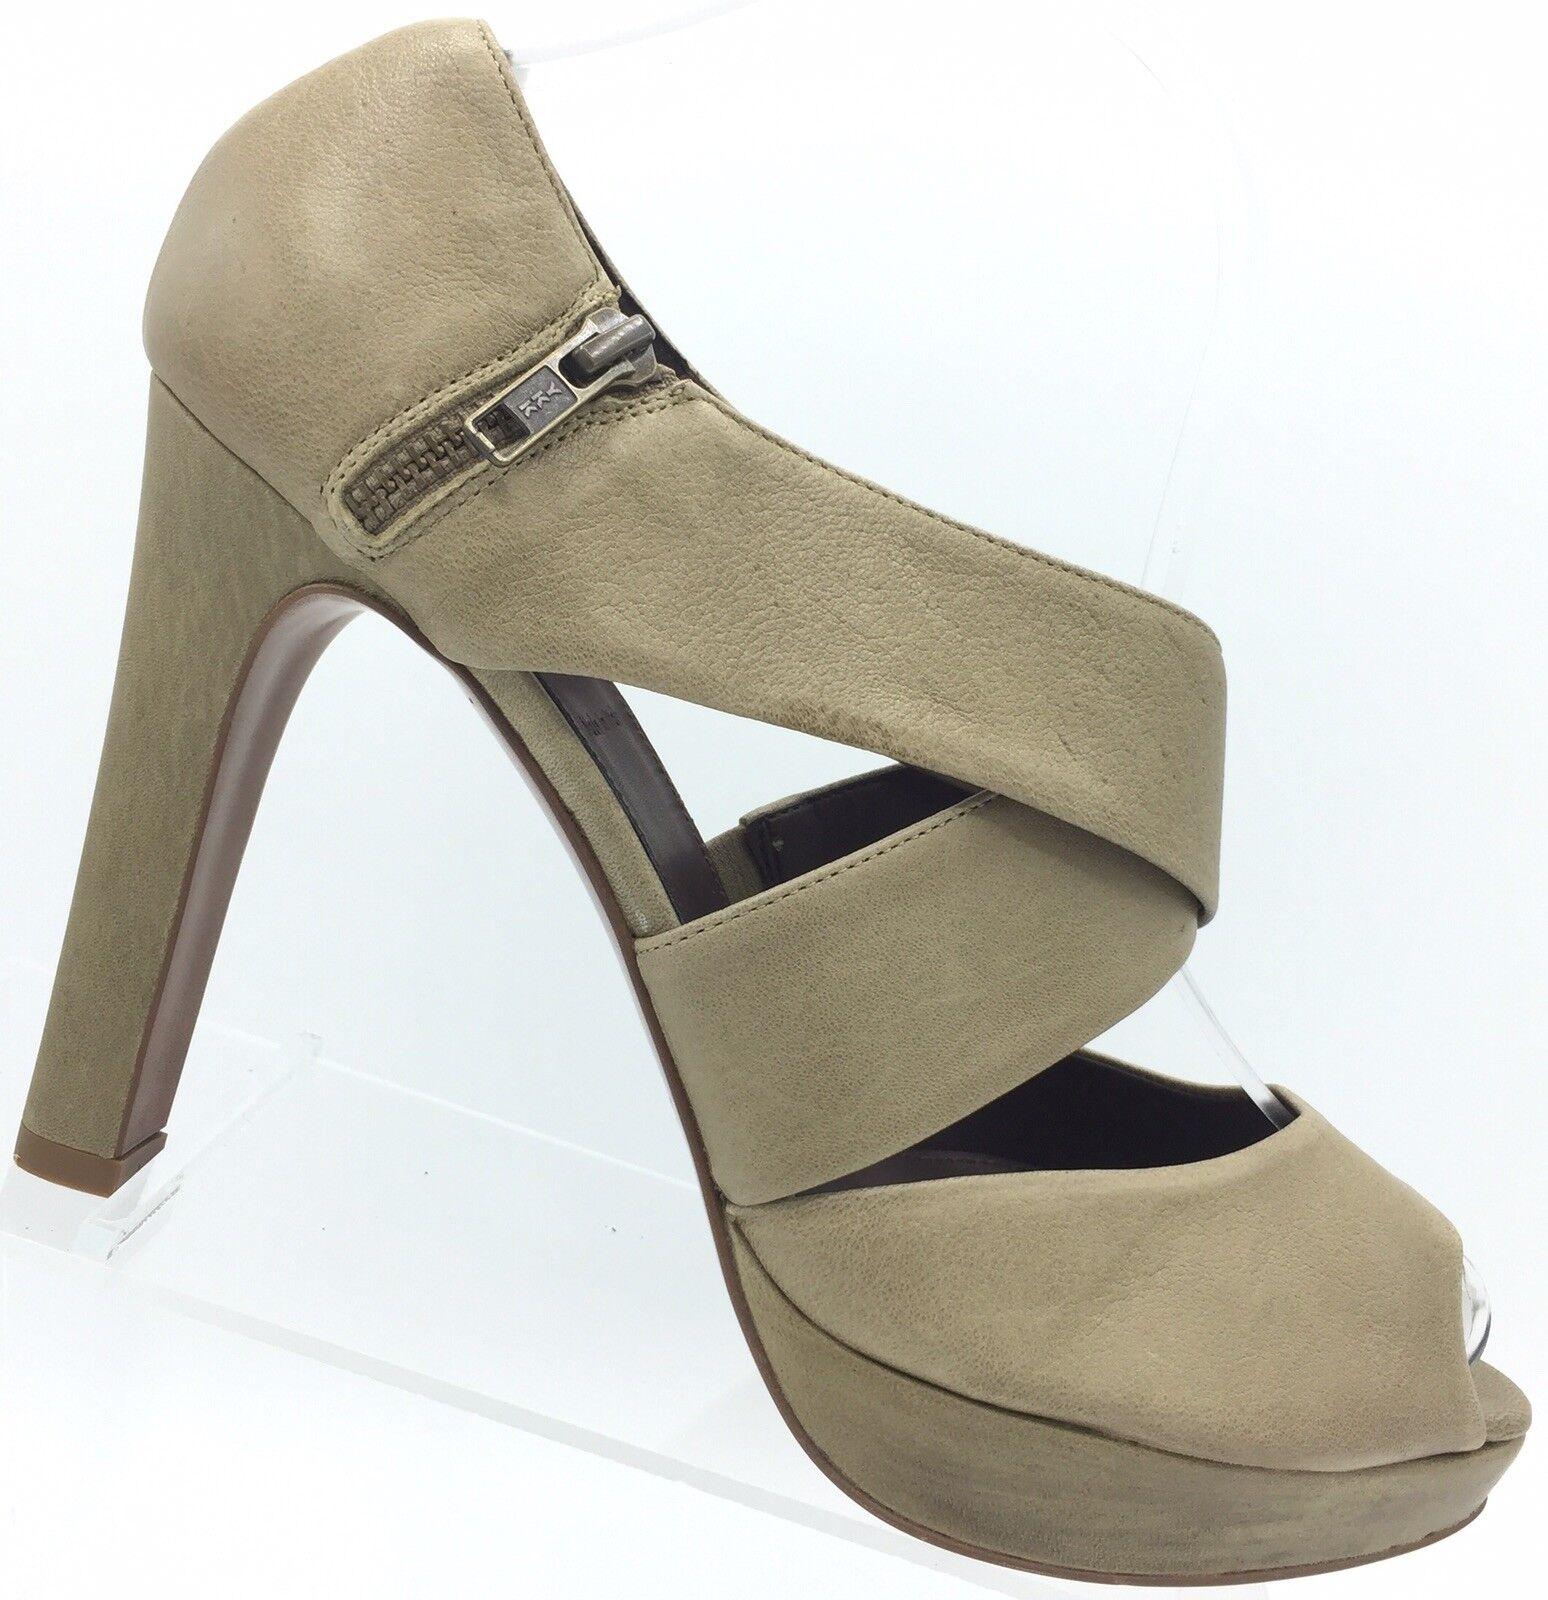 fino al 50% di sconto J Crew Heels Heels Heels Lindy Italian Leather Platform Peep Toe Tan Beige Sz 10 Retail  265  disegni esclusivi